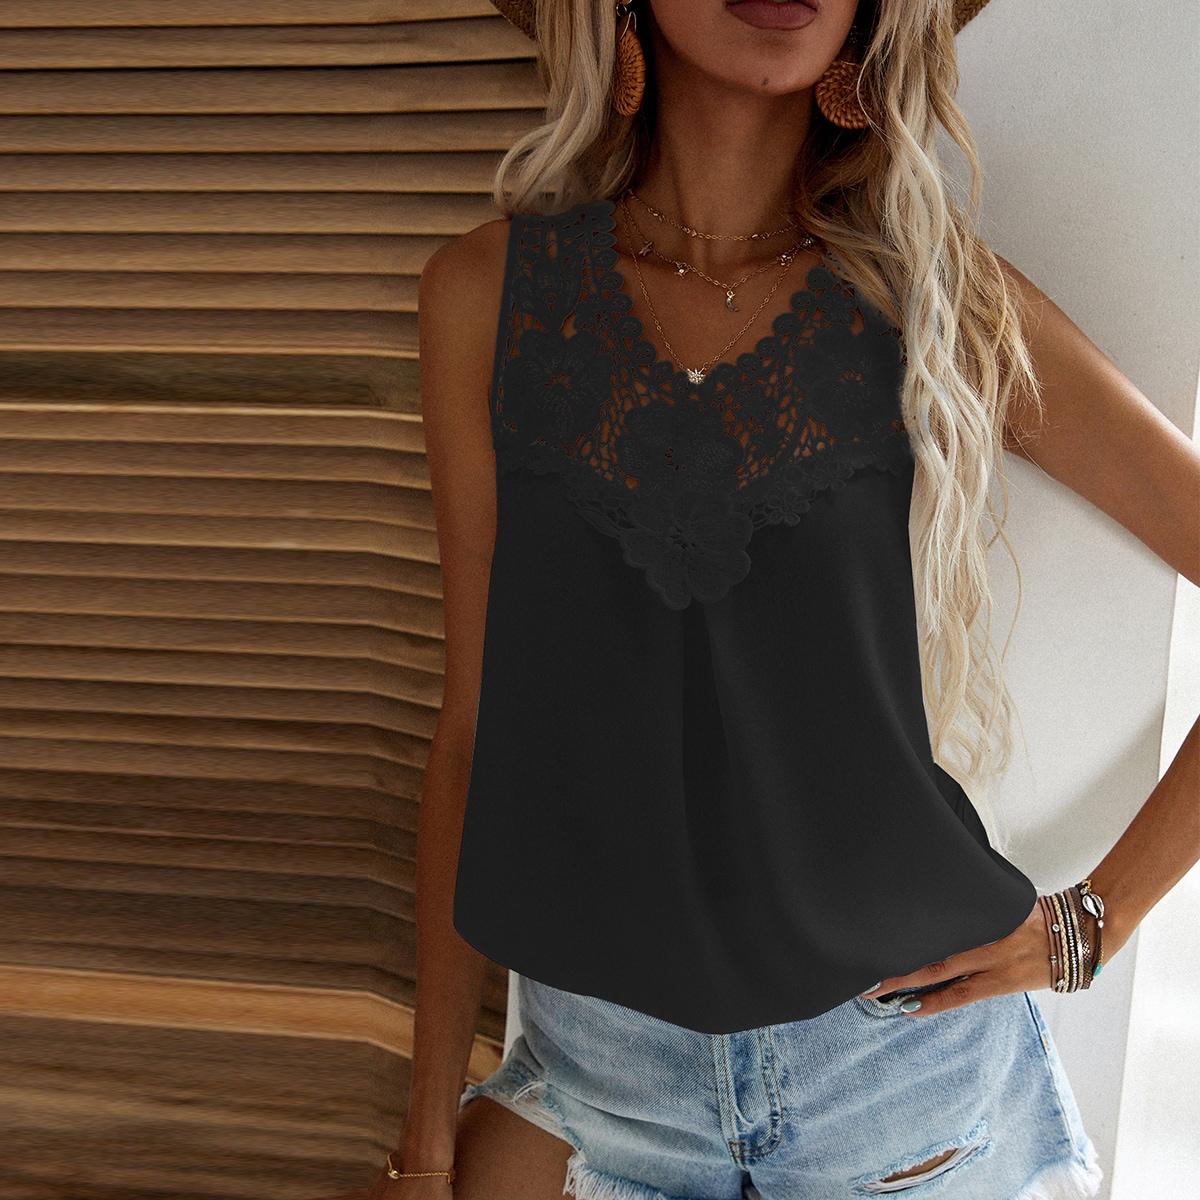 Однотонная блуза с кружевом SheIn swblouse23210519196